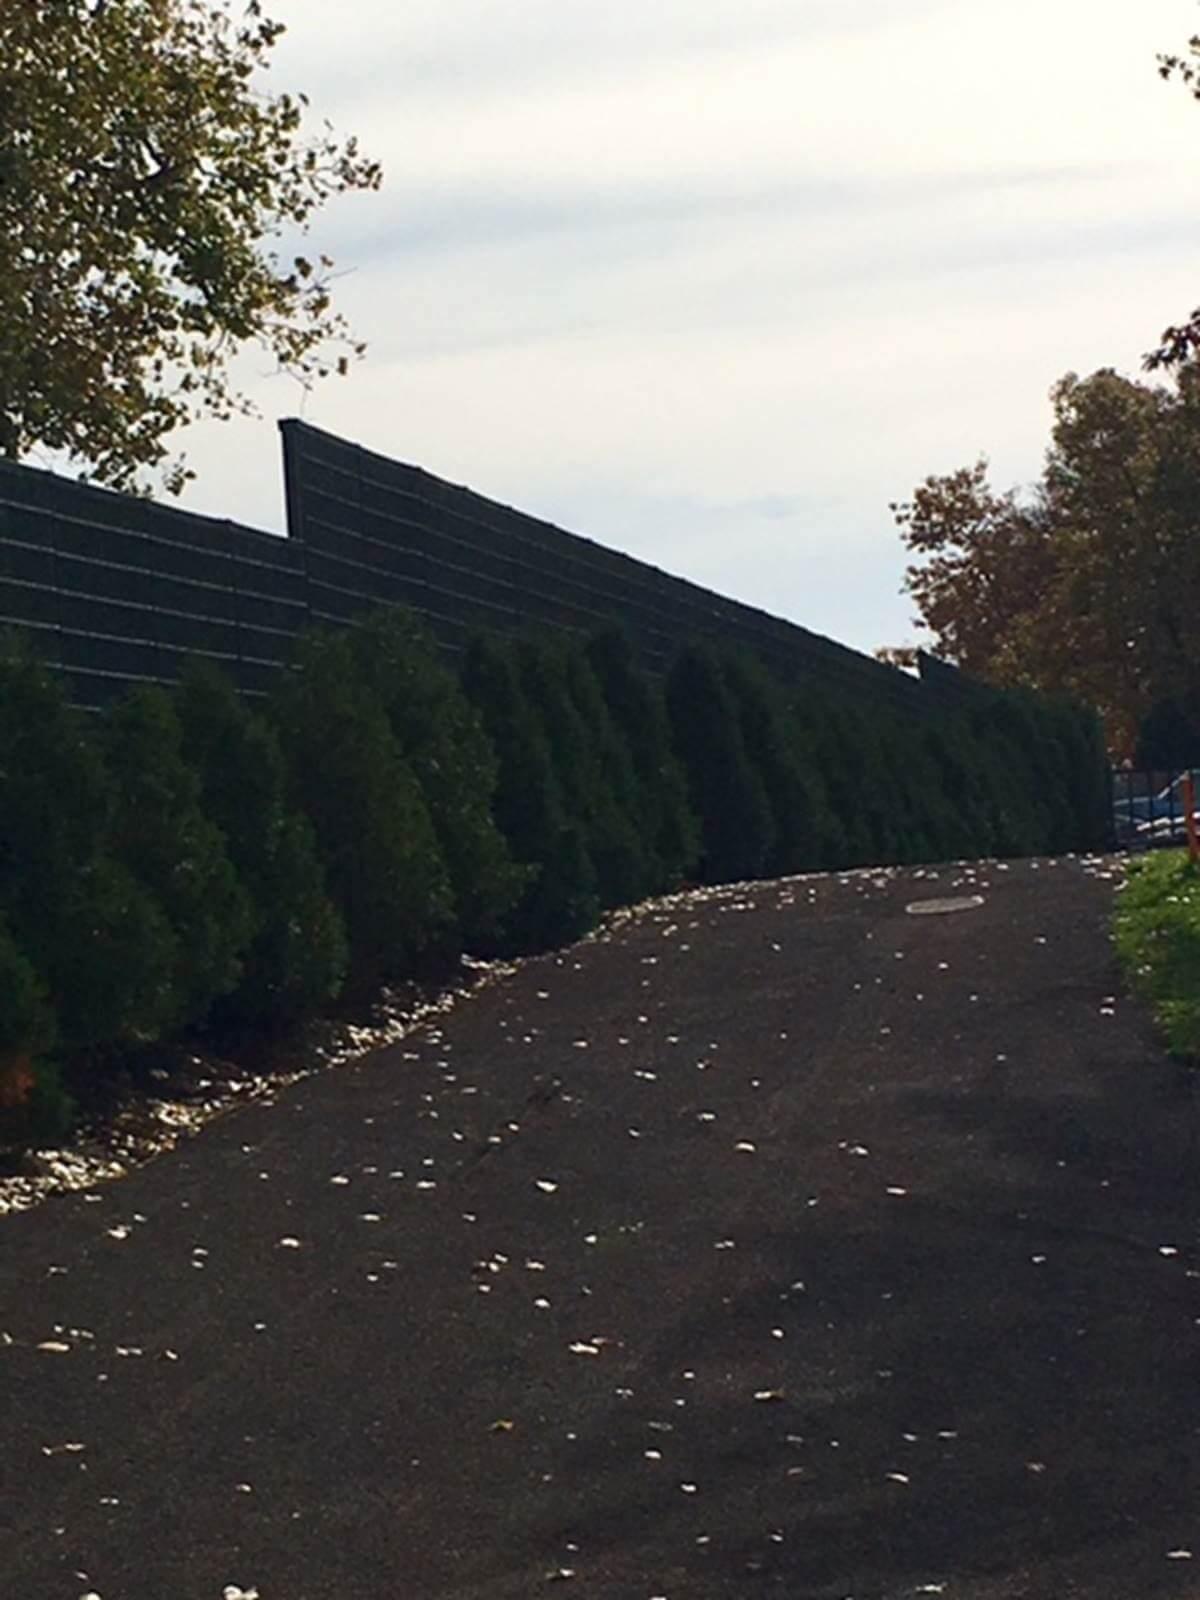 outdoor sound barrier walls